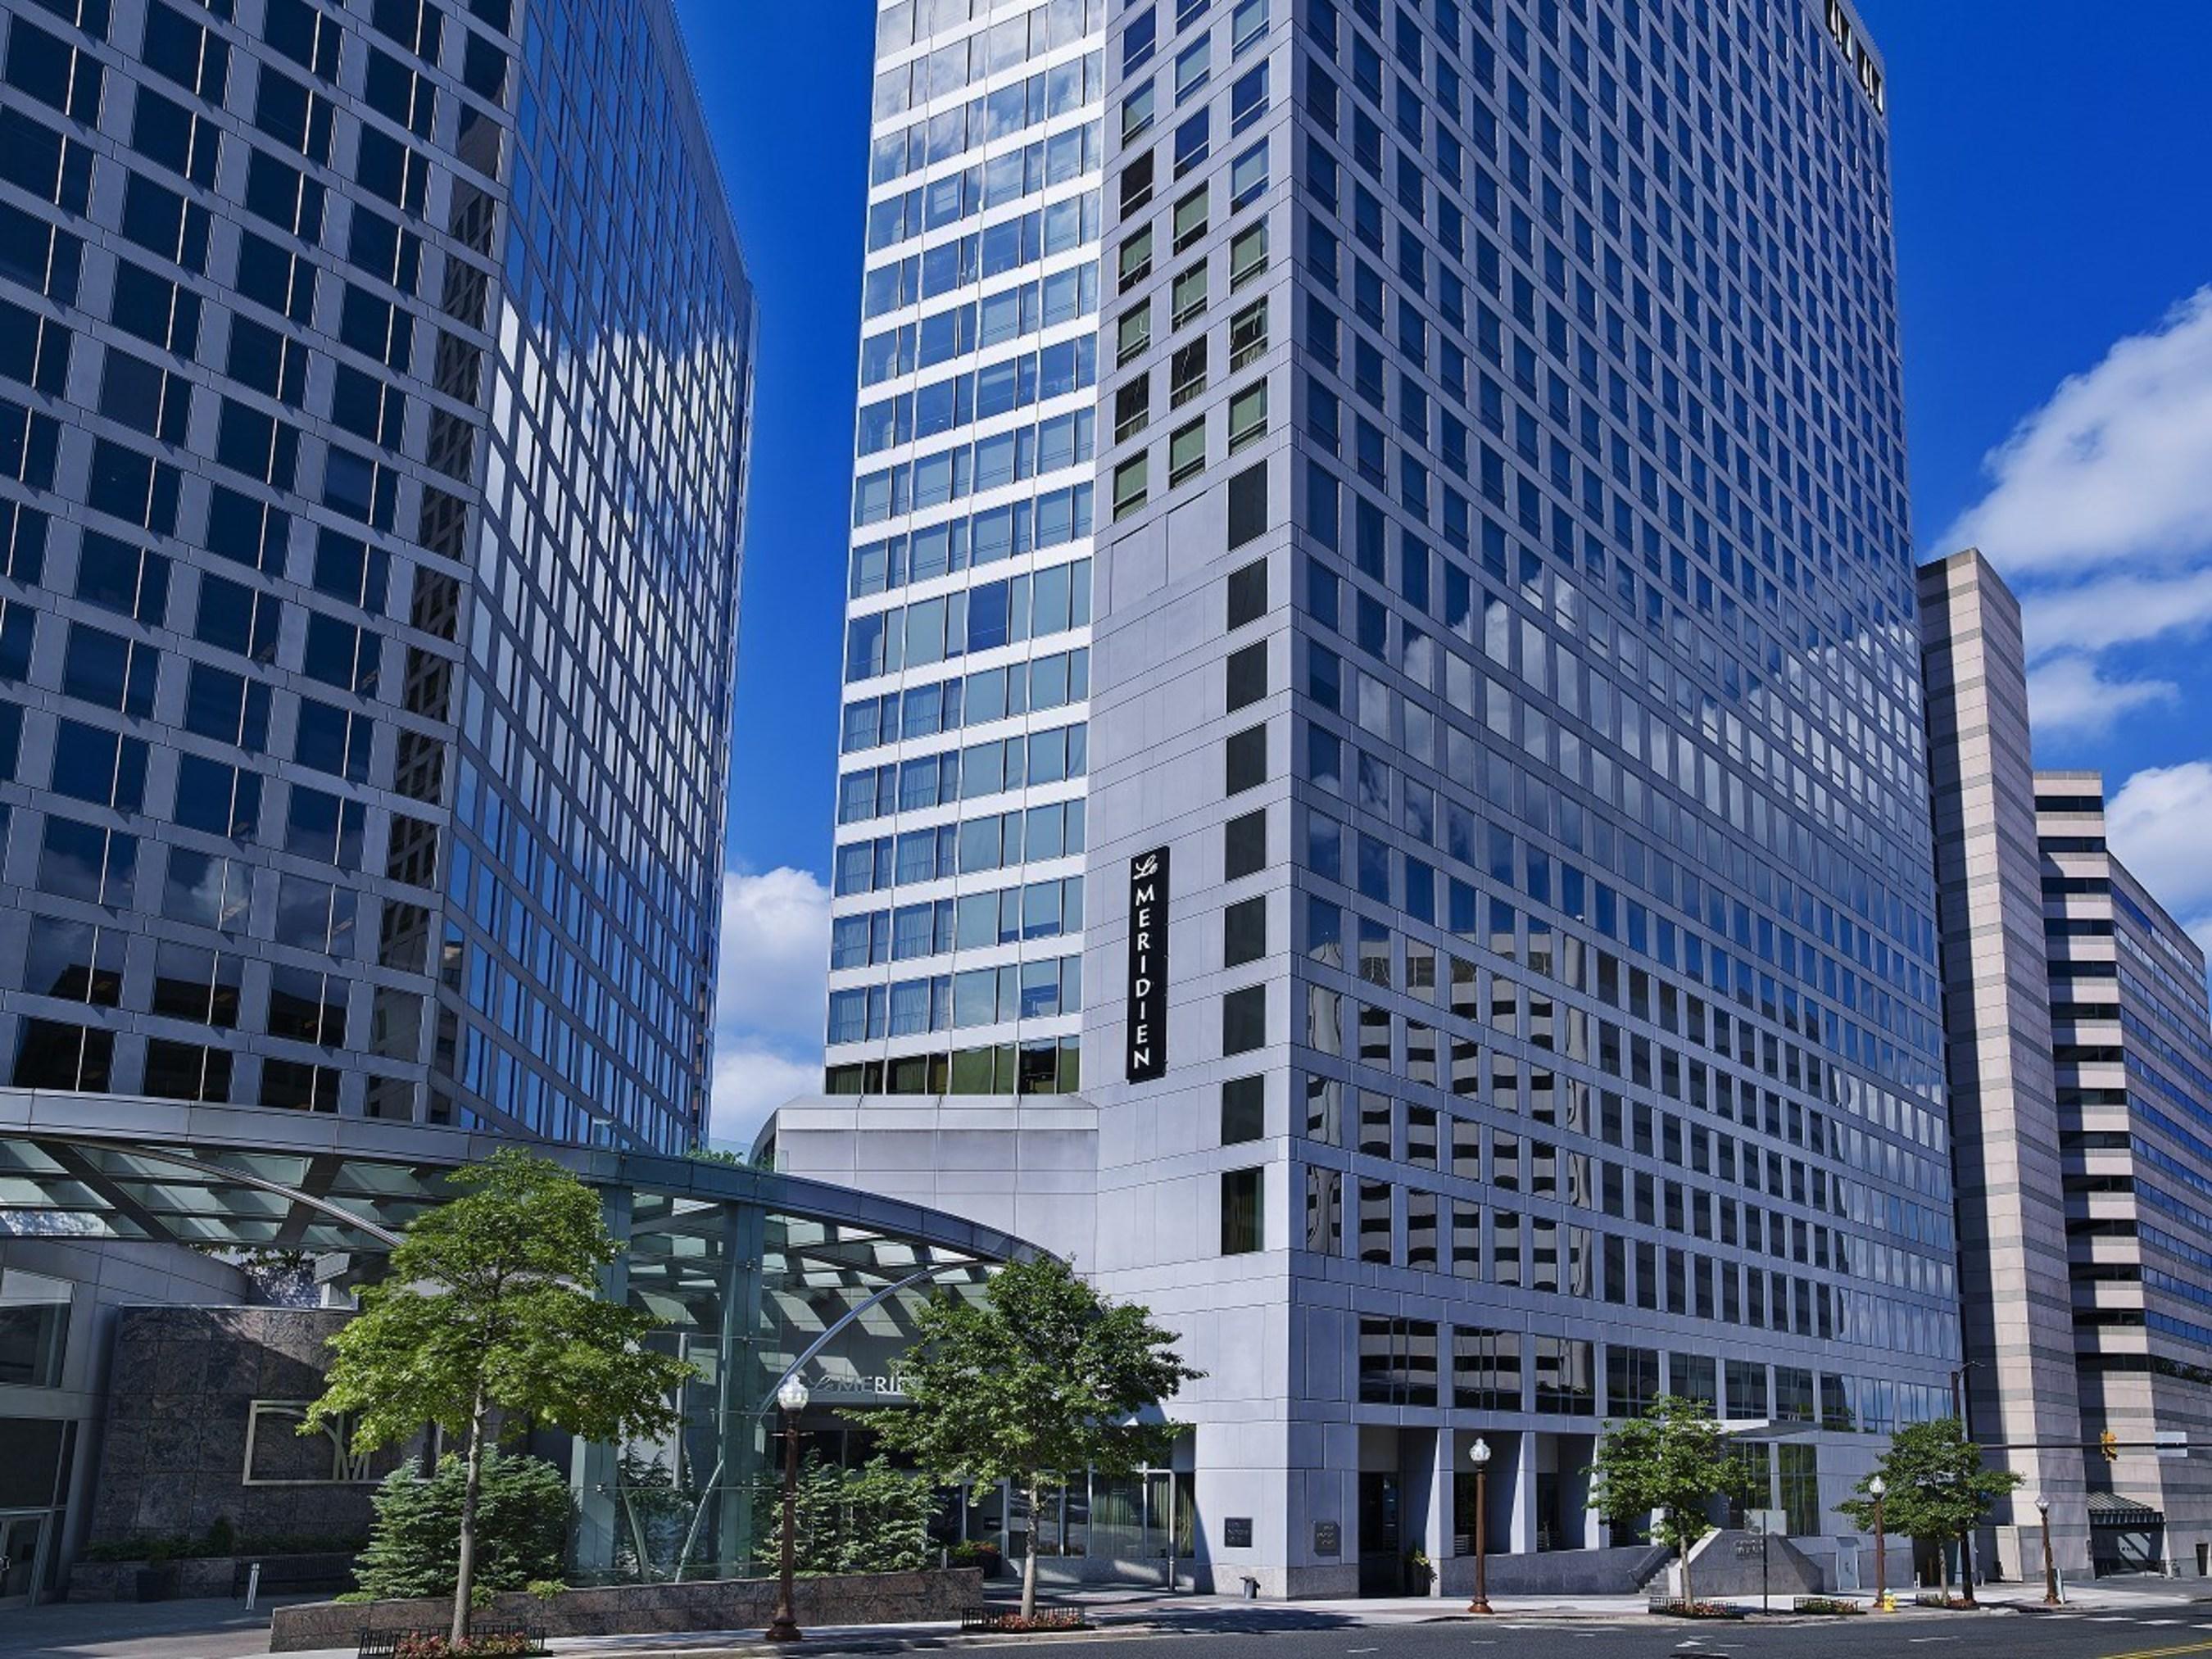 Carey Watermark Investors 2 Acquires Le Meridien Arlington